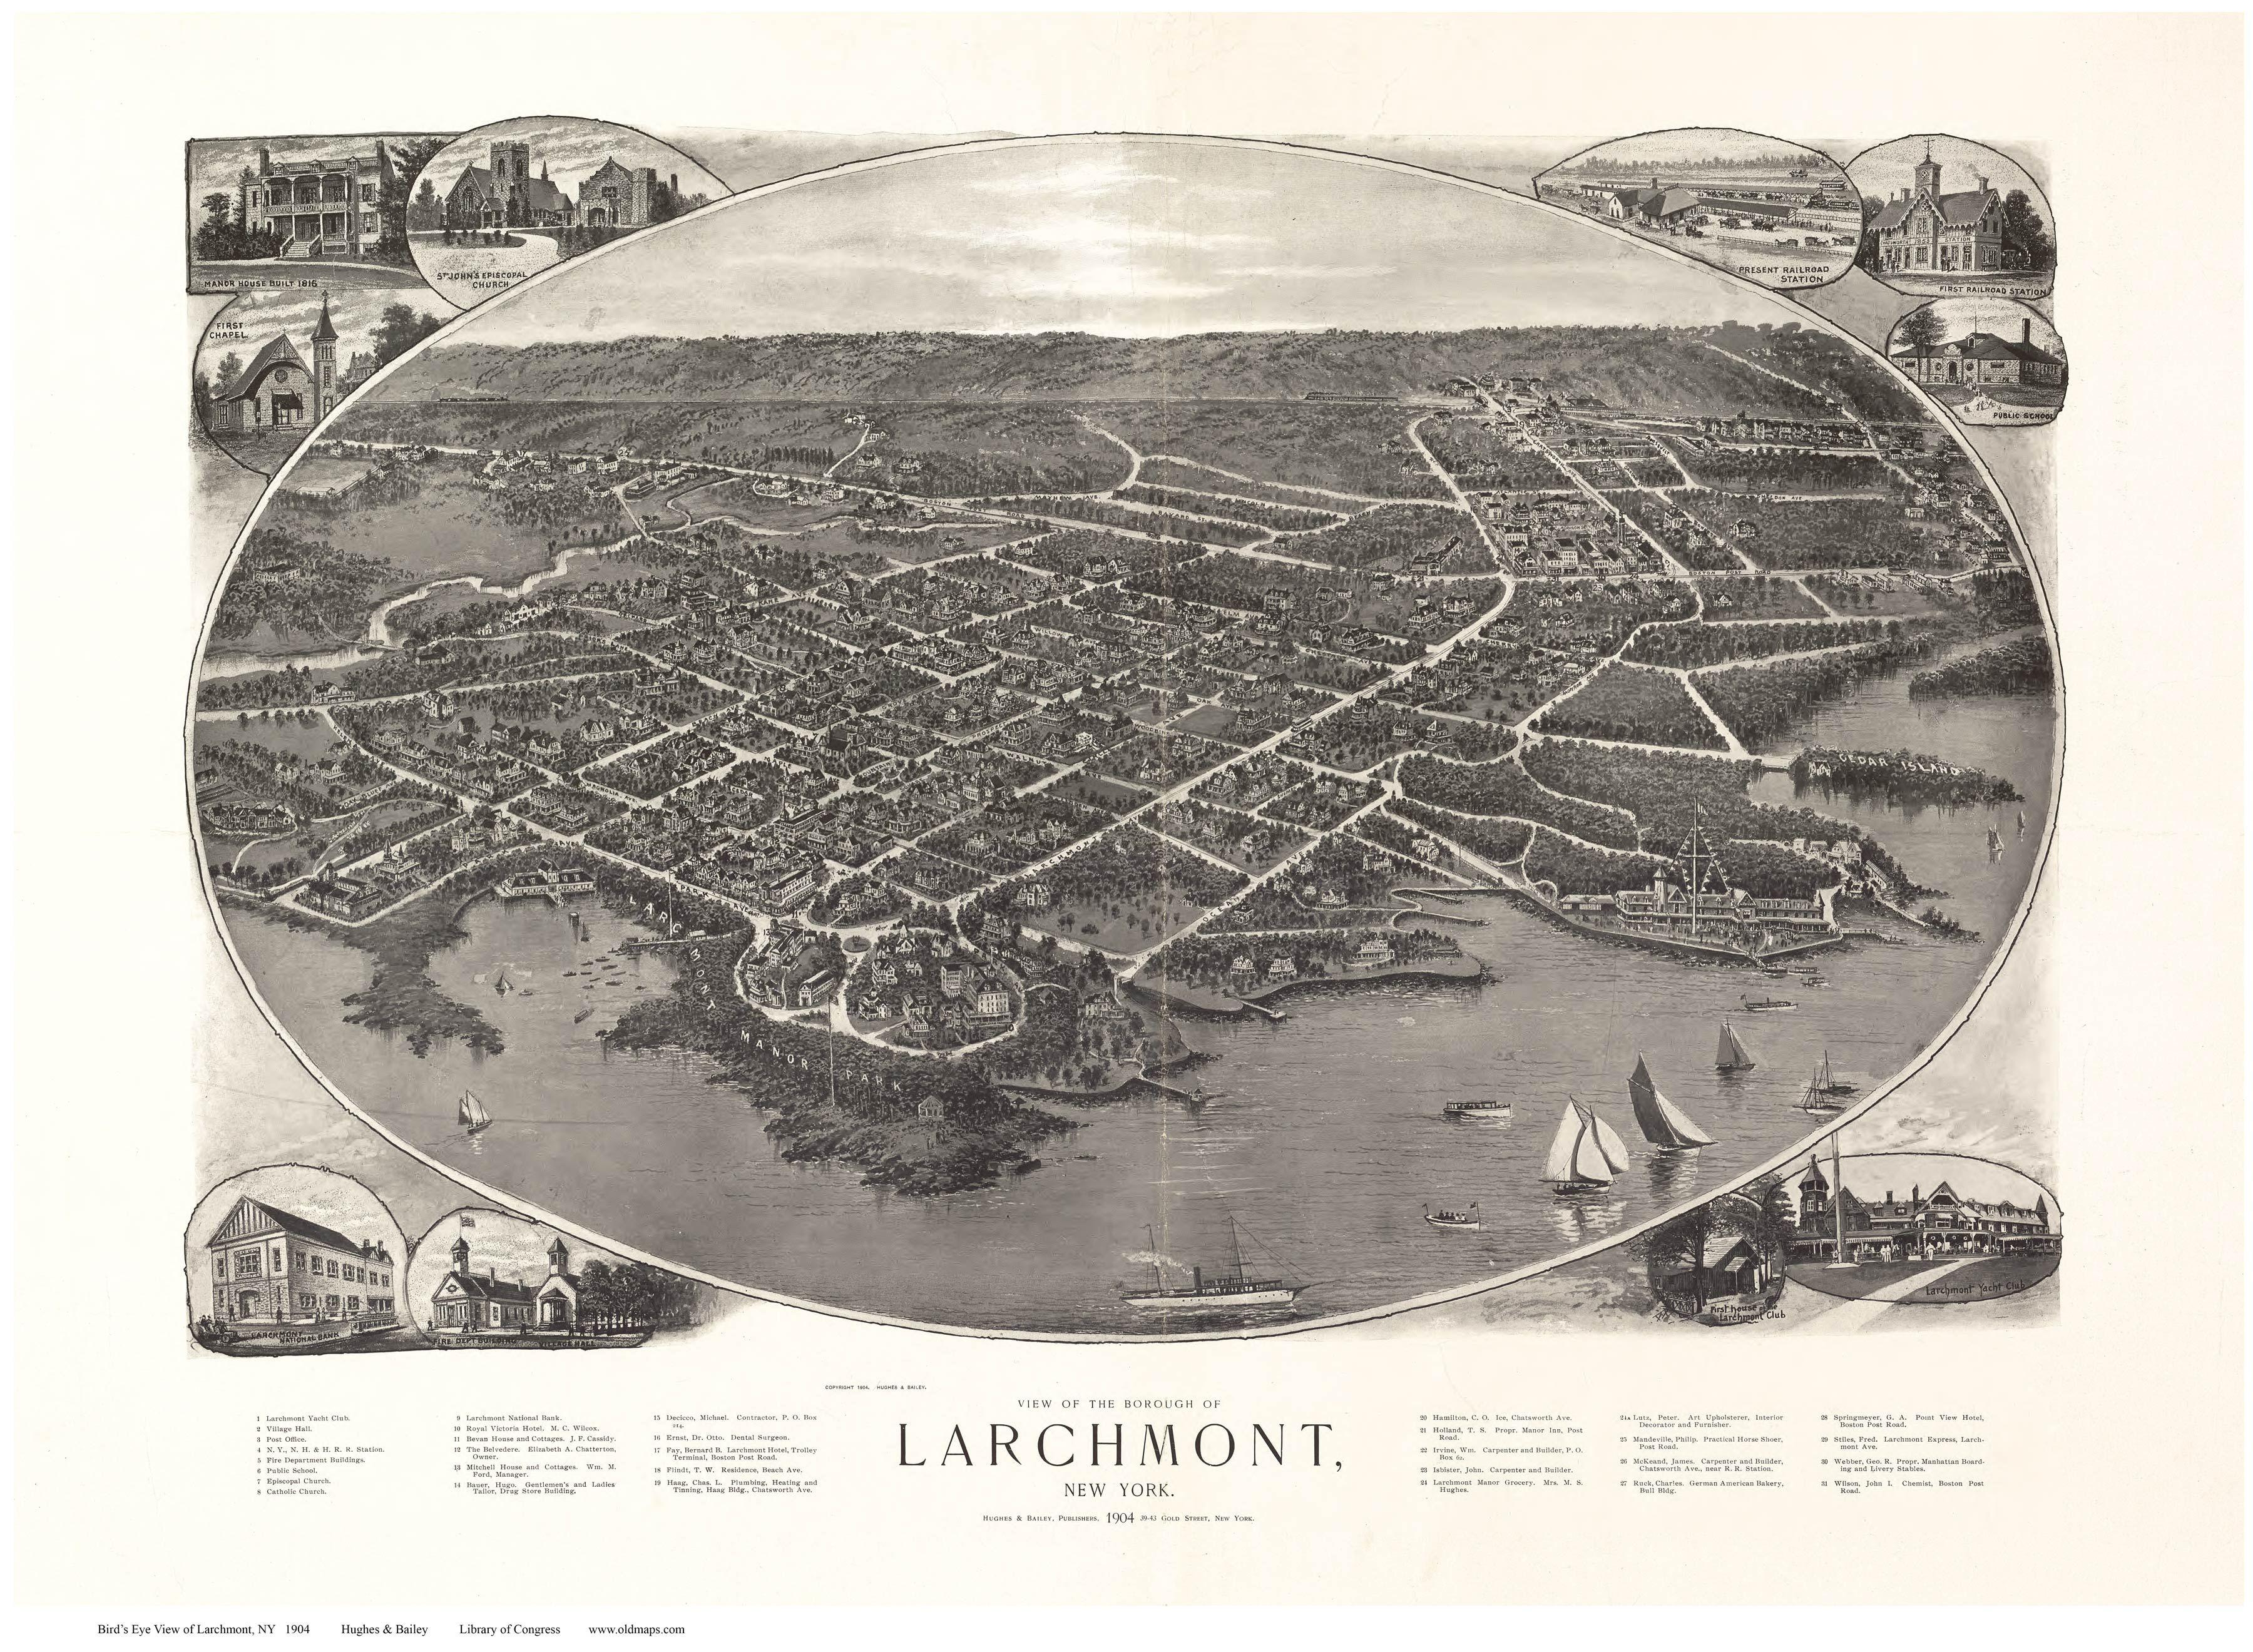 Larchmont, New York, 1904